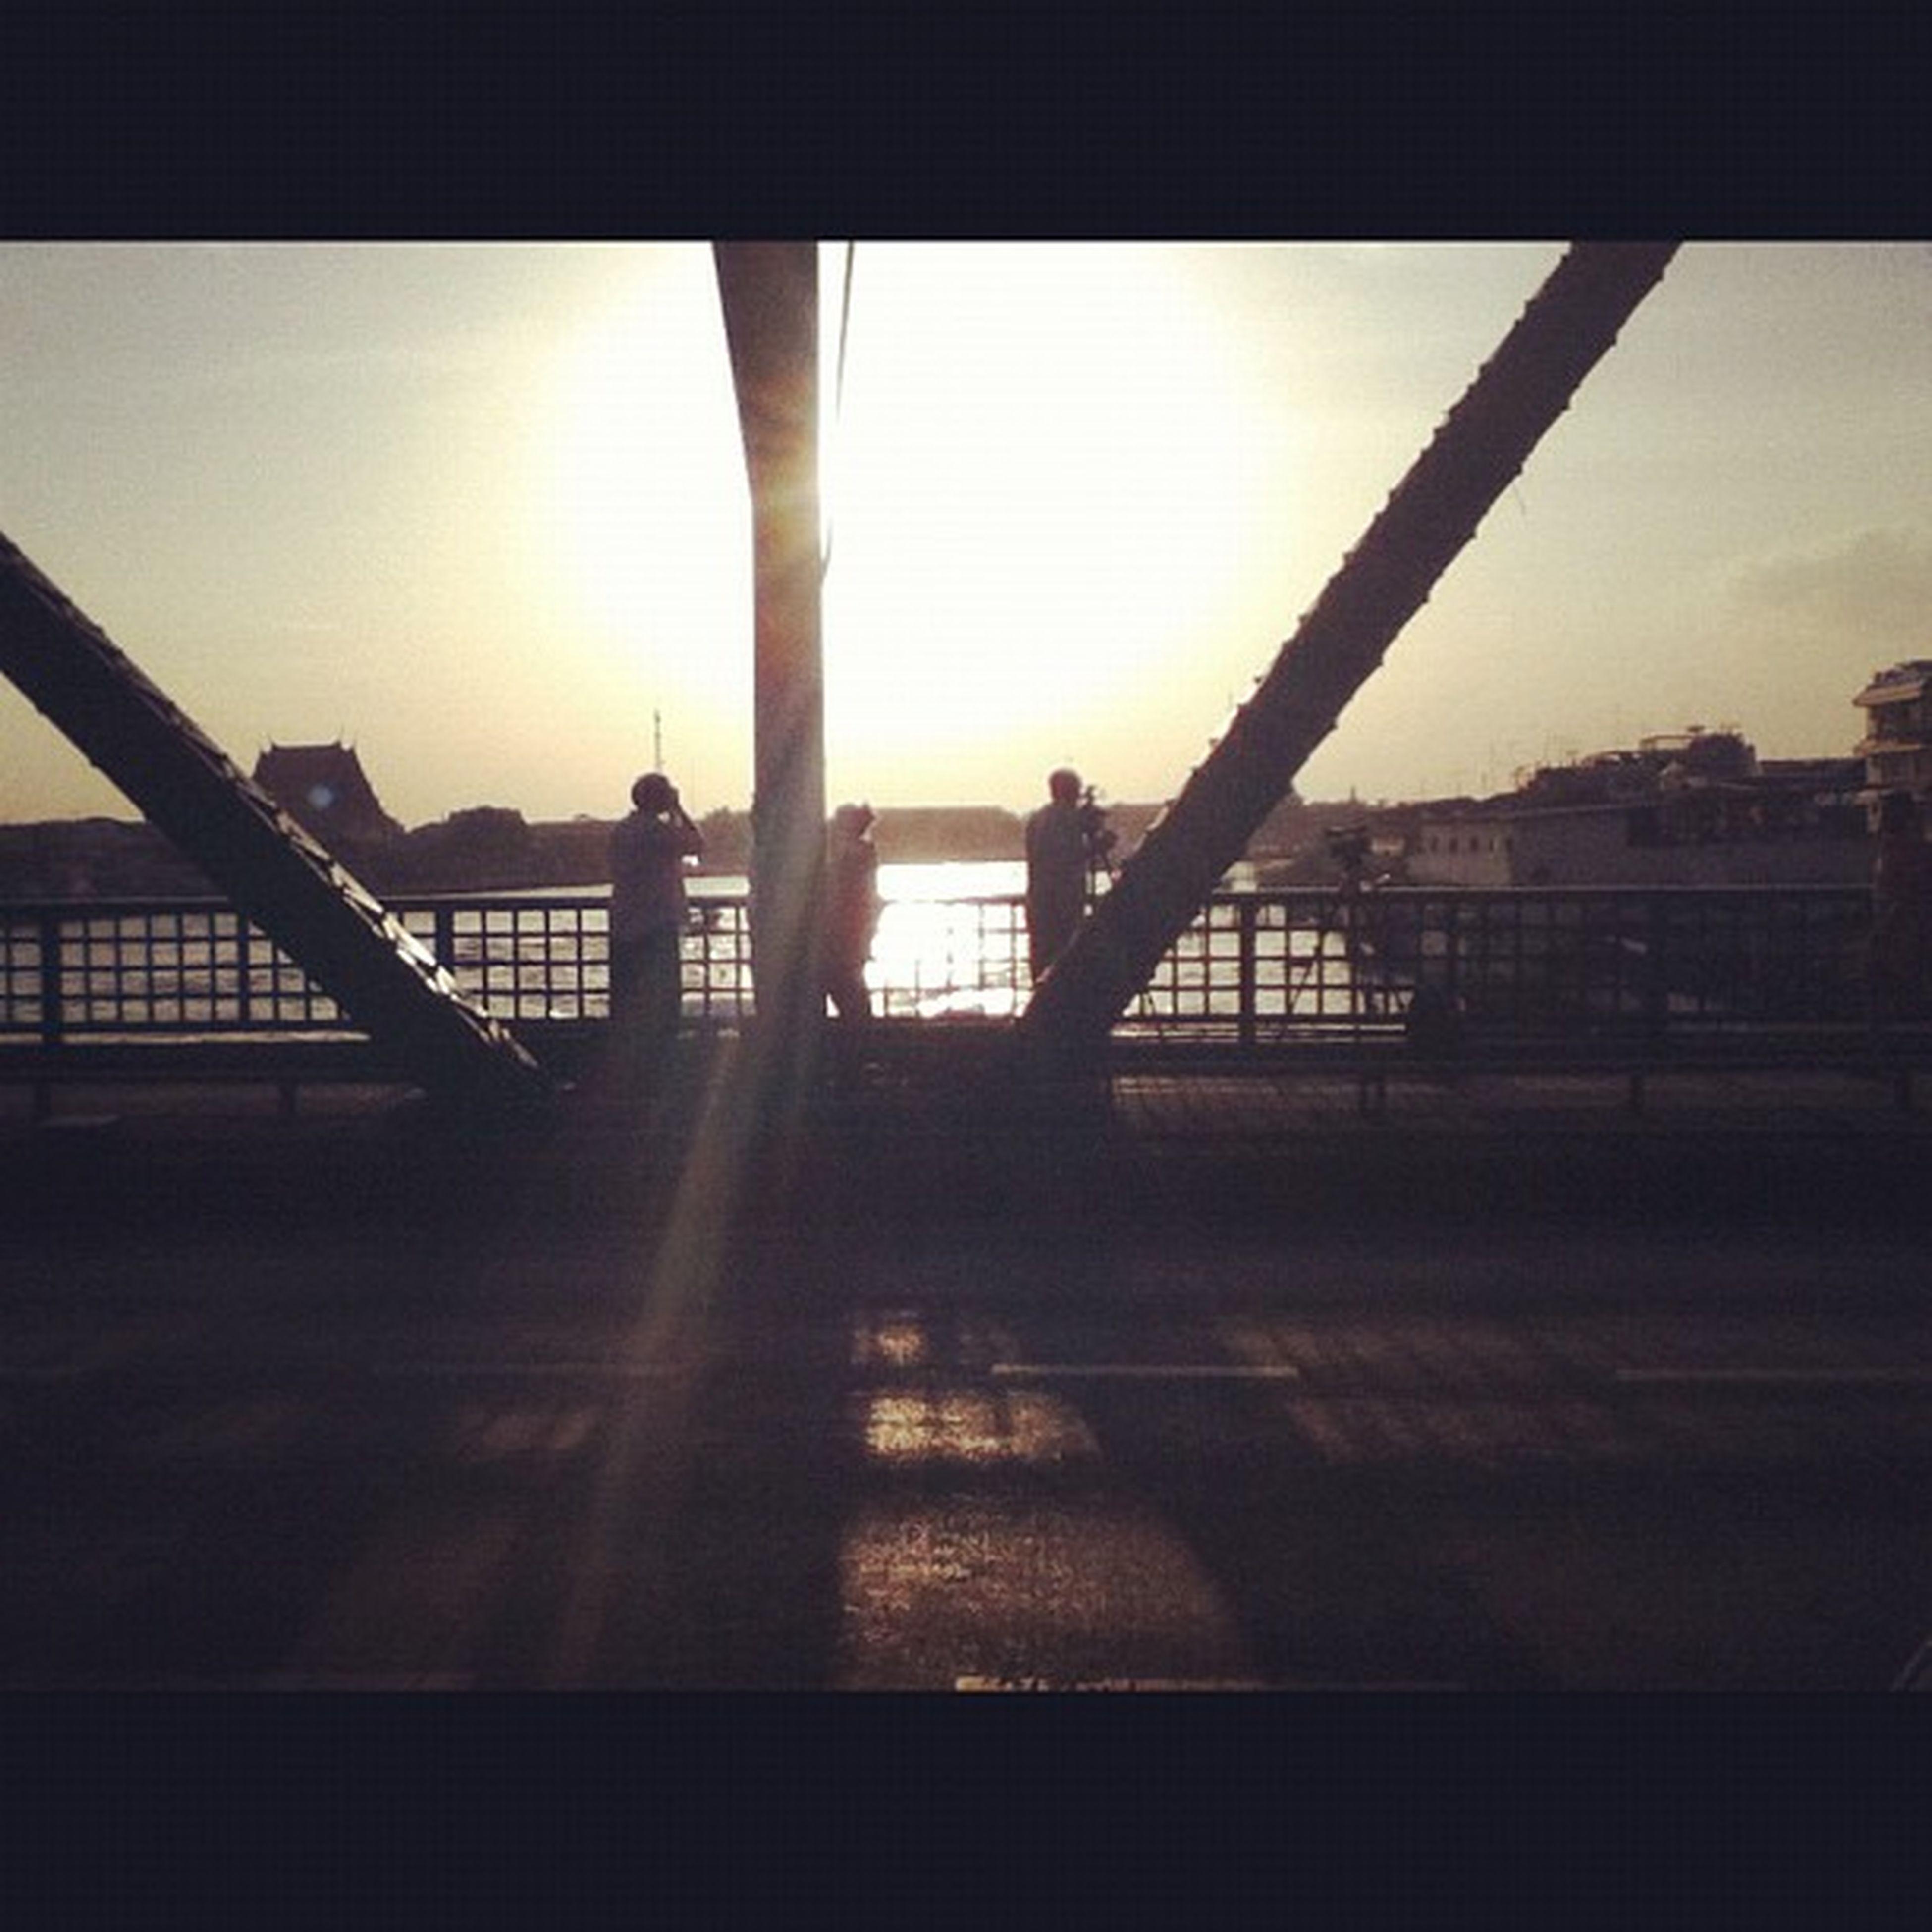 sunset, silhouette, sun, water, sunlight, built structure, sky, architecture, orange color, bridge - man made structure, reflection, railing, sunbeam, transportation, lens flare, nature, river, sea, outdoors, bridge